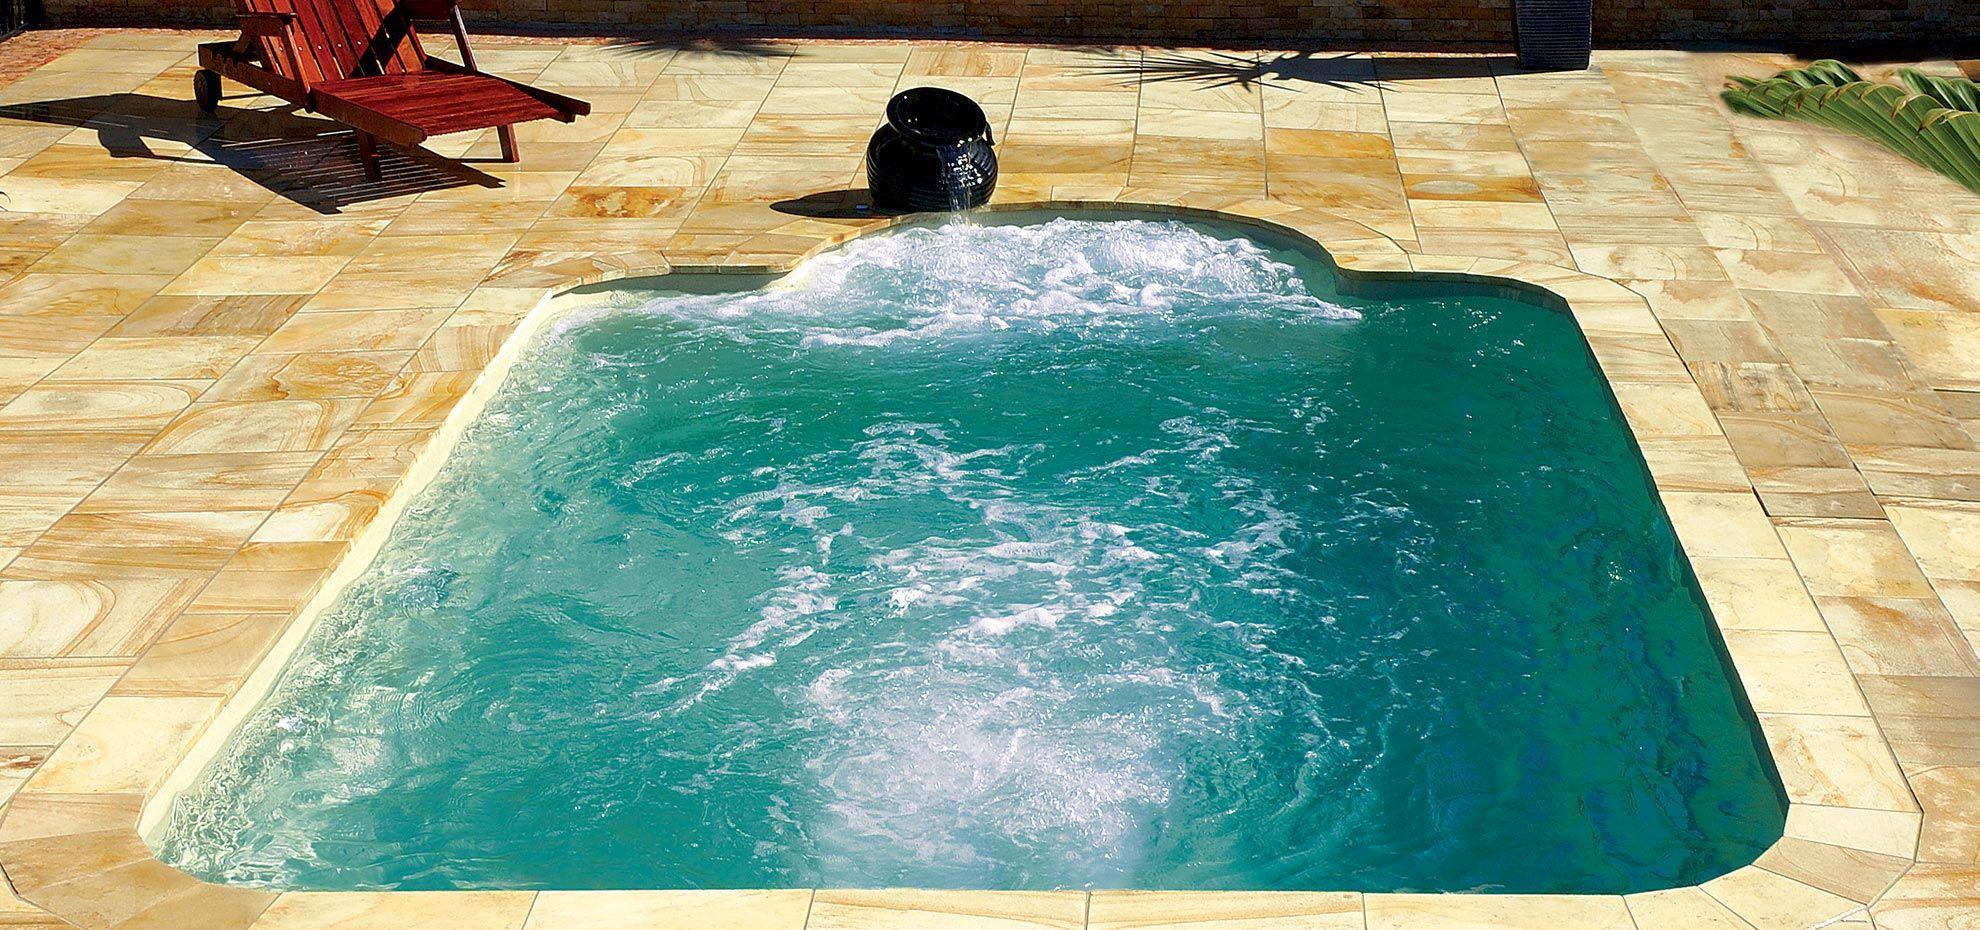 The Courtyard Roman Leisure Pools Leisure Pools Pool Fiberglass Swimming Pools